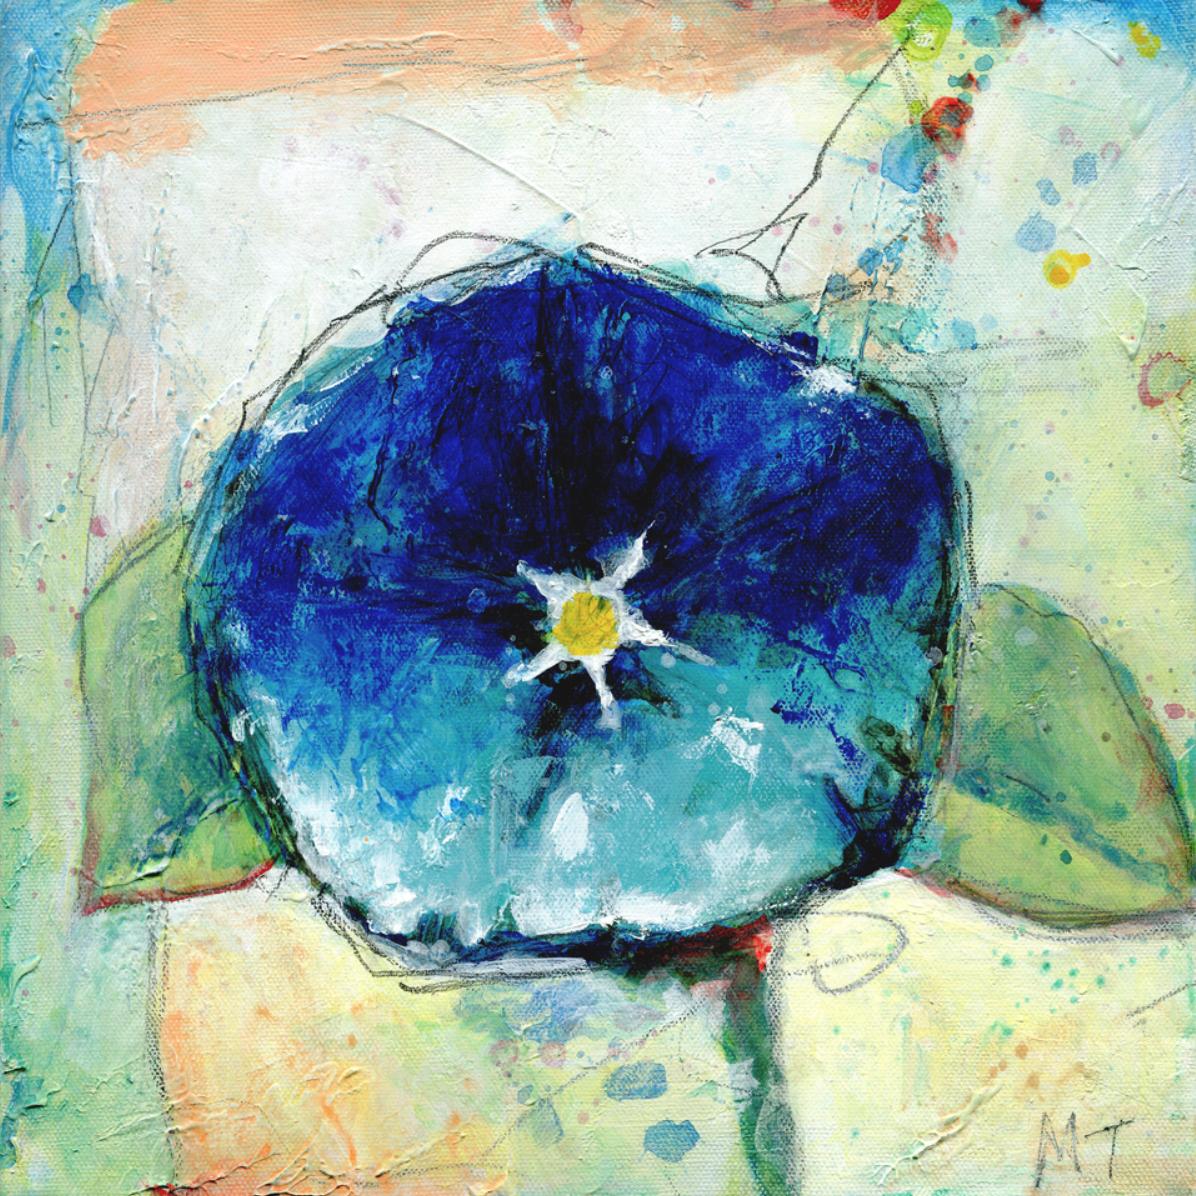 mandy_thompson_painting_abstract_flower_blue_morning_glory.jpg